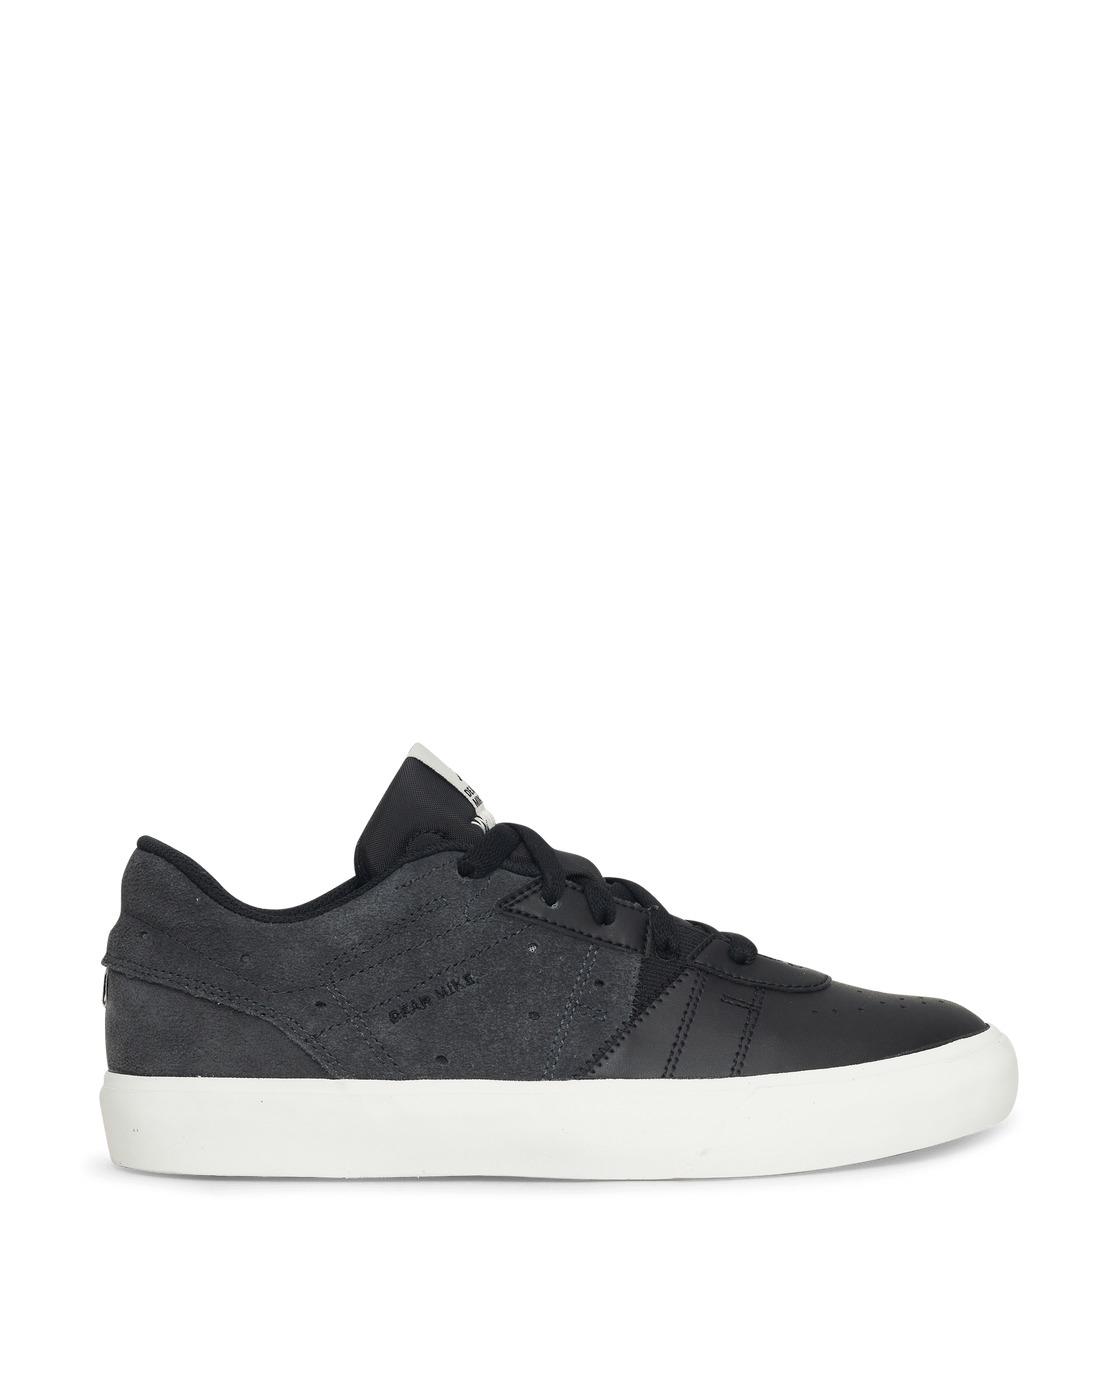 Photo: Nike Jordan Series 01 Sneakers Anthracite/Black